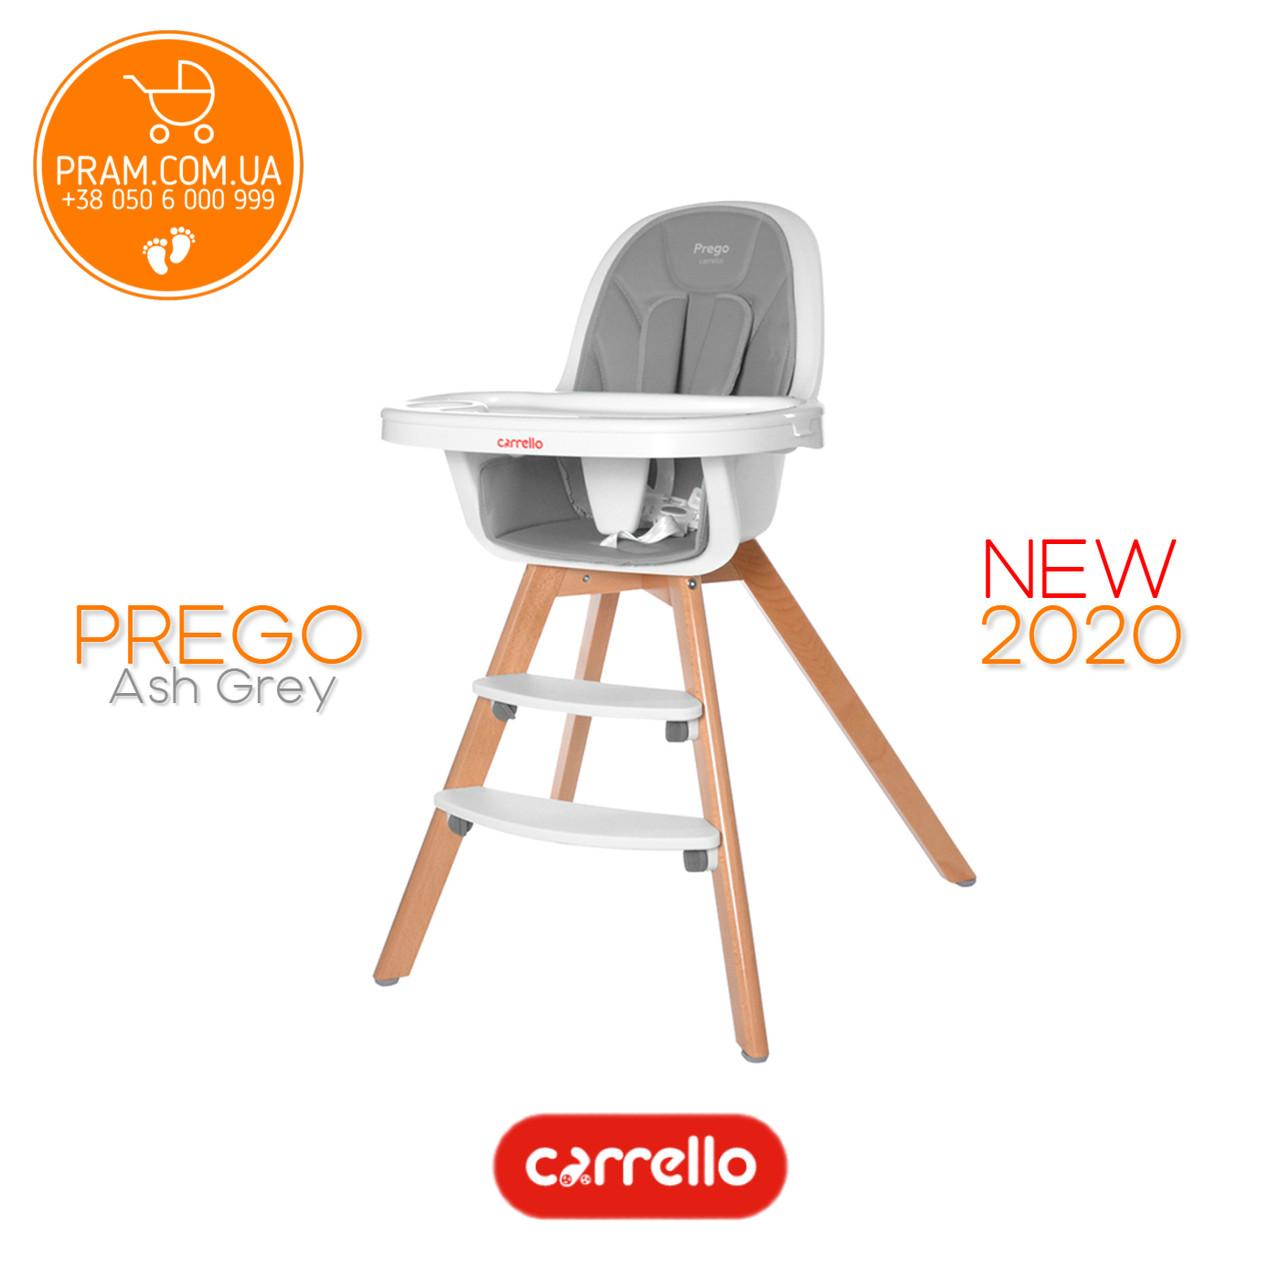 CARRELLO PREGO CRL-9504 стульчик для кормления Ash Grey Серый